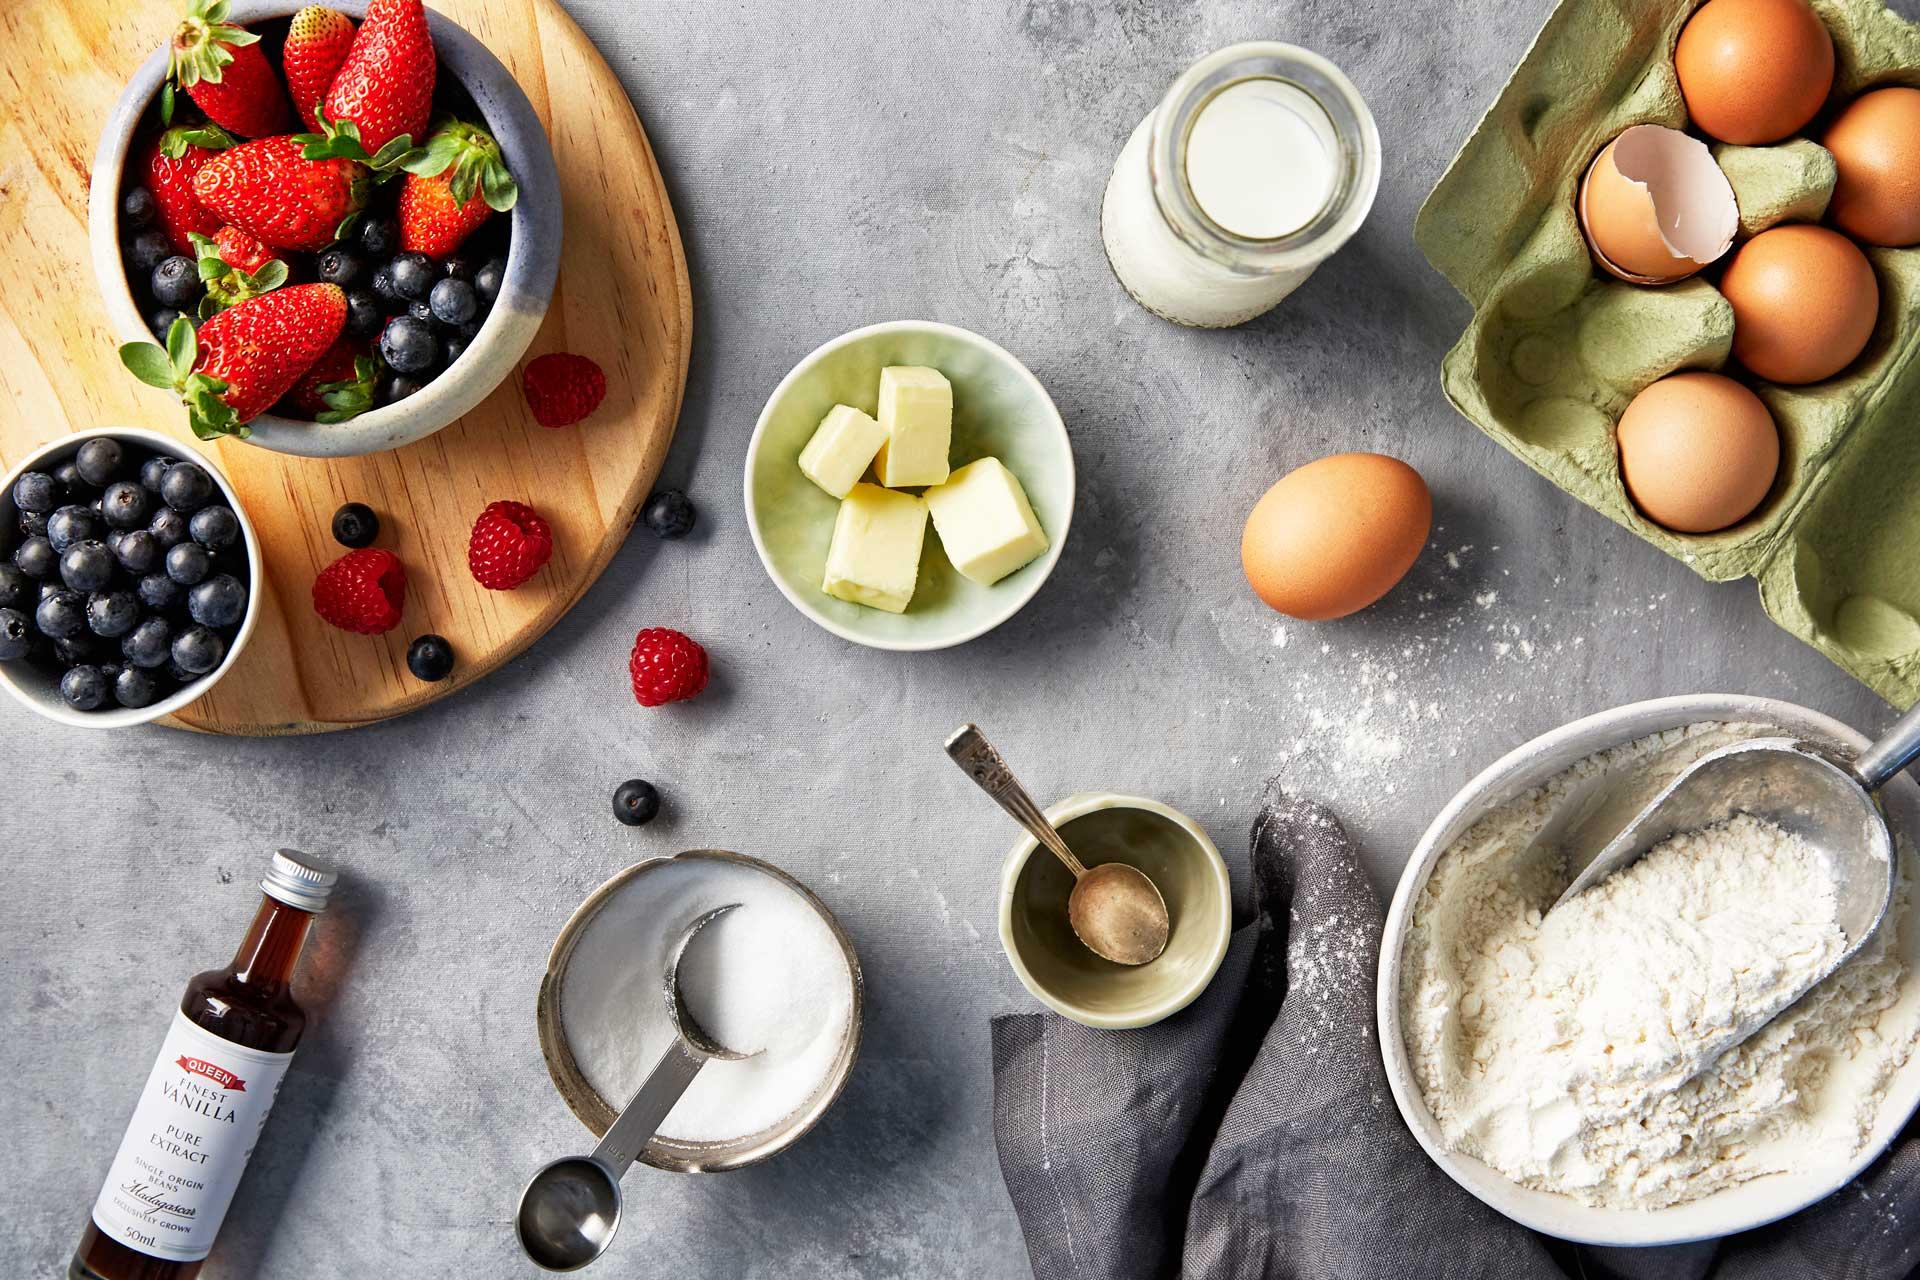 food-photography-16c